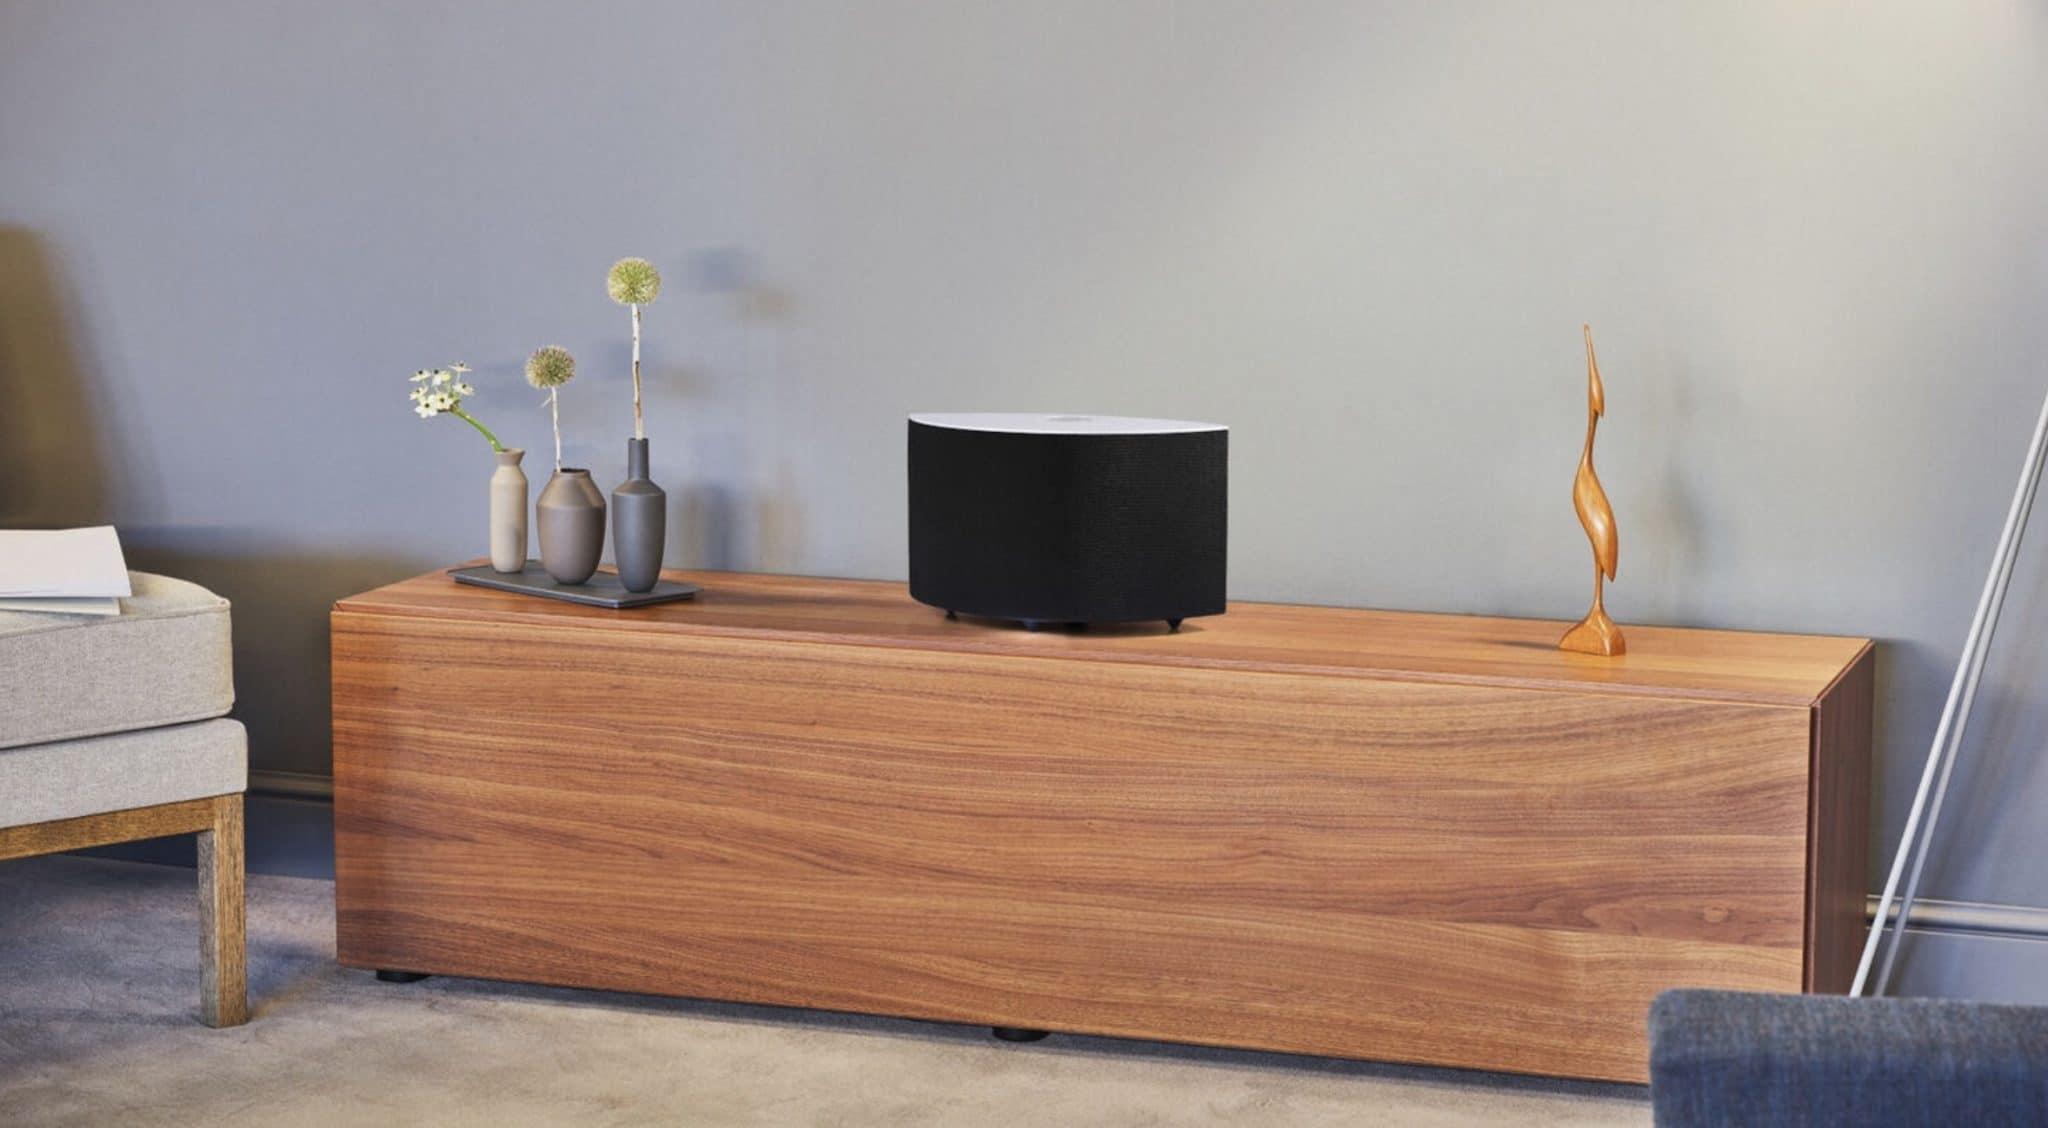 Ottava SC-C30 wireless speaker From Technics